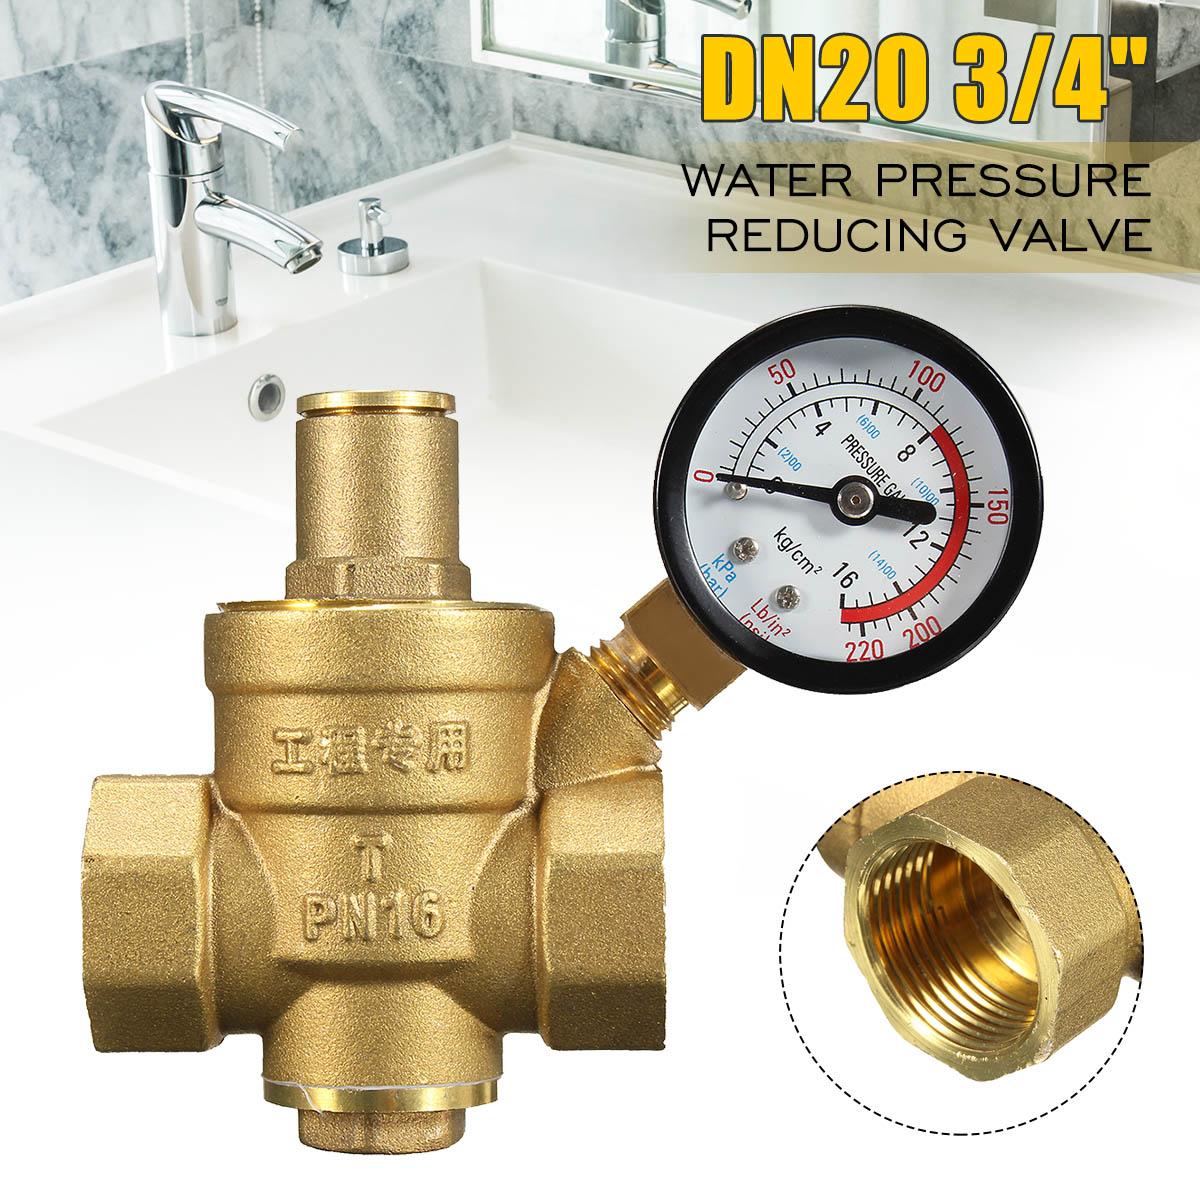 PN 1.6 Adjustable Water Pressure Regulator Reducer Brass DN20 NPT 3/4